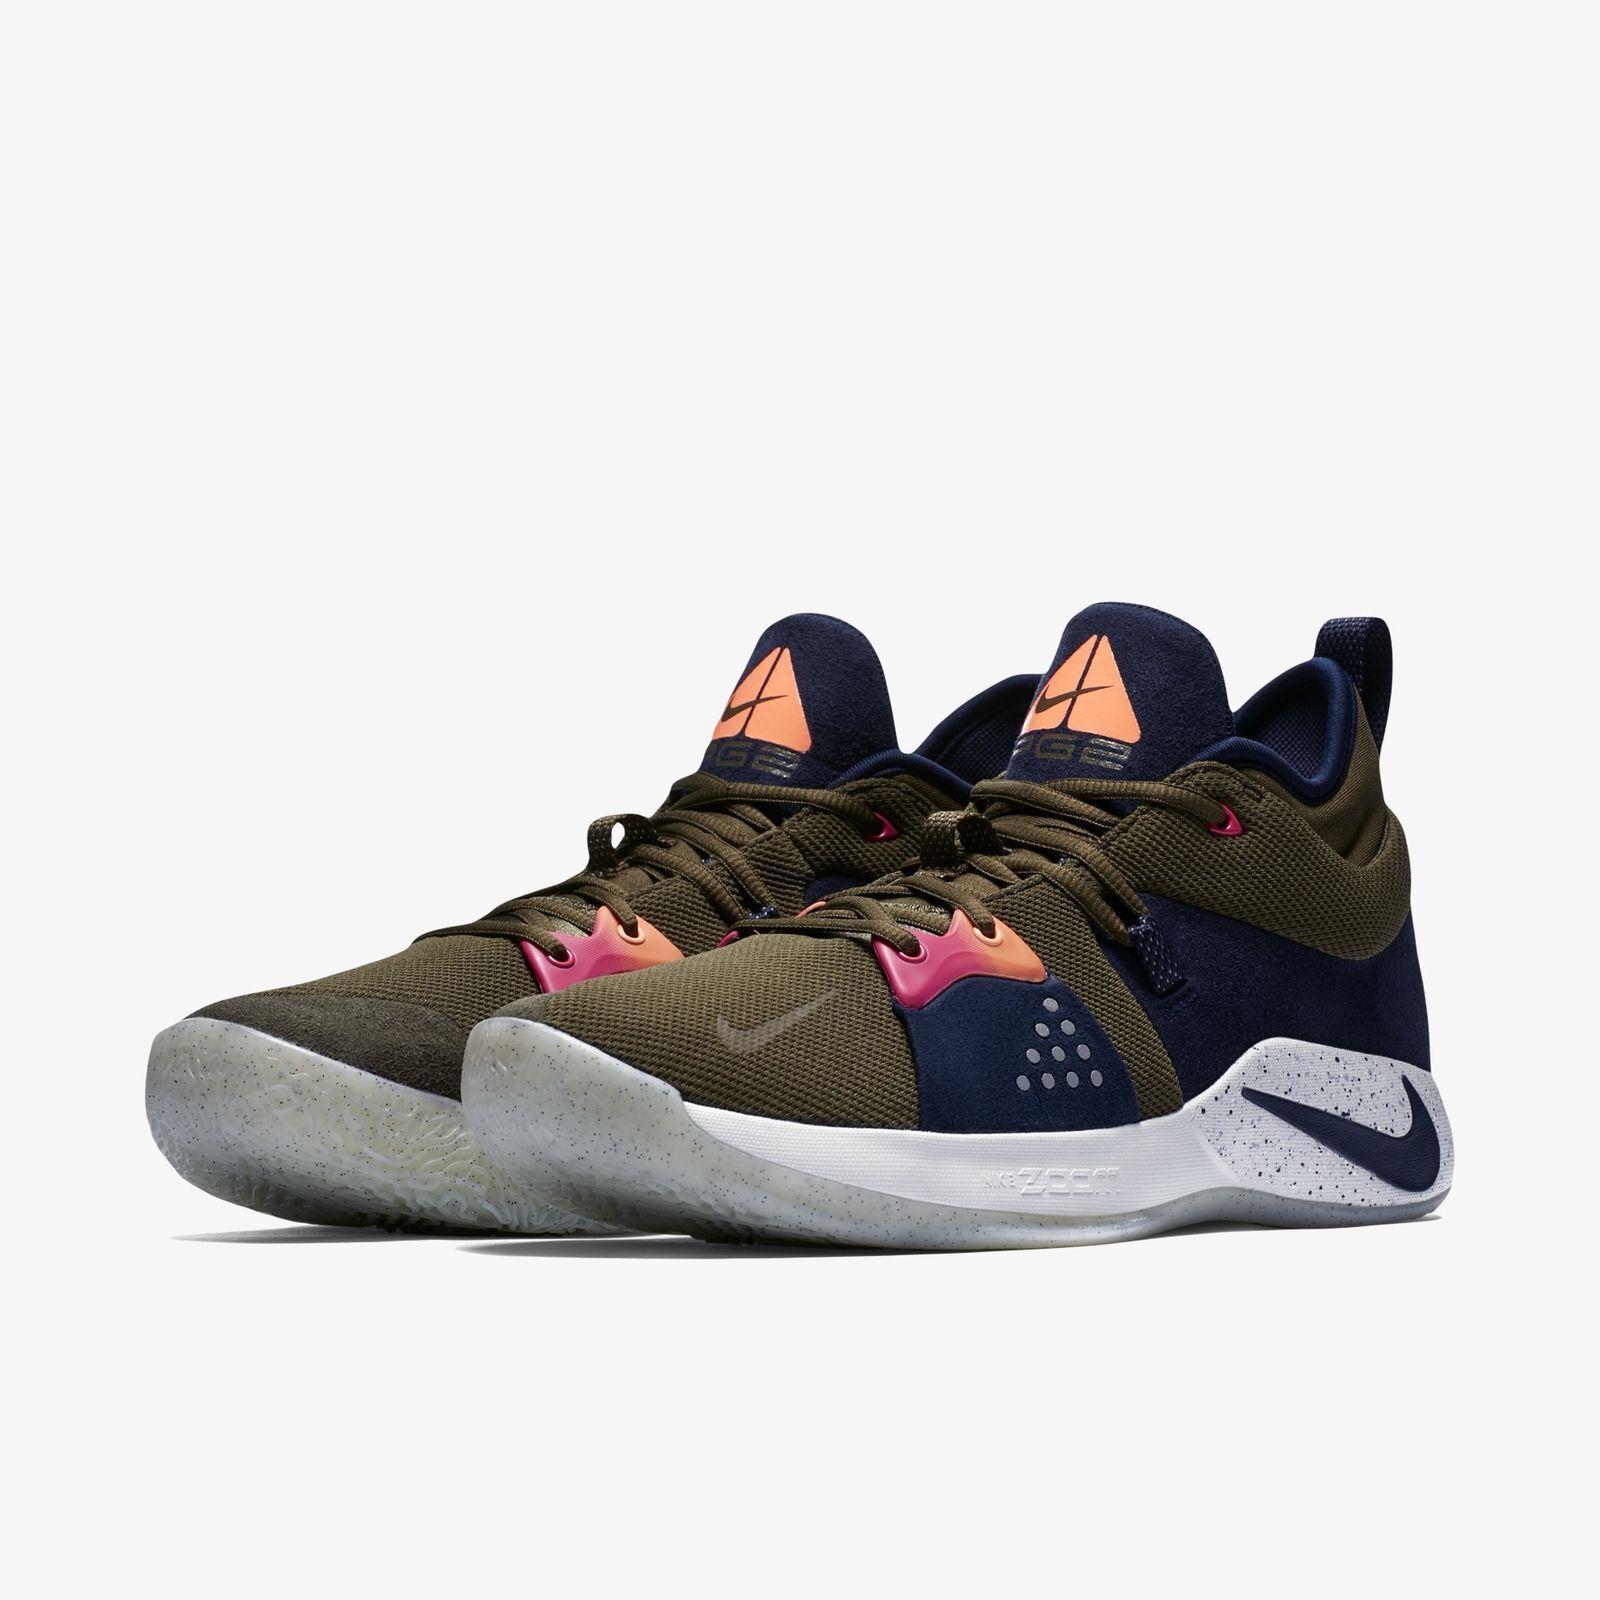 Nike pg 2 uomini scarpe da basket dimensioni: aj2039 11,5 olive tela ossidiana aj2039 dimensioni: 300 f83625